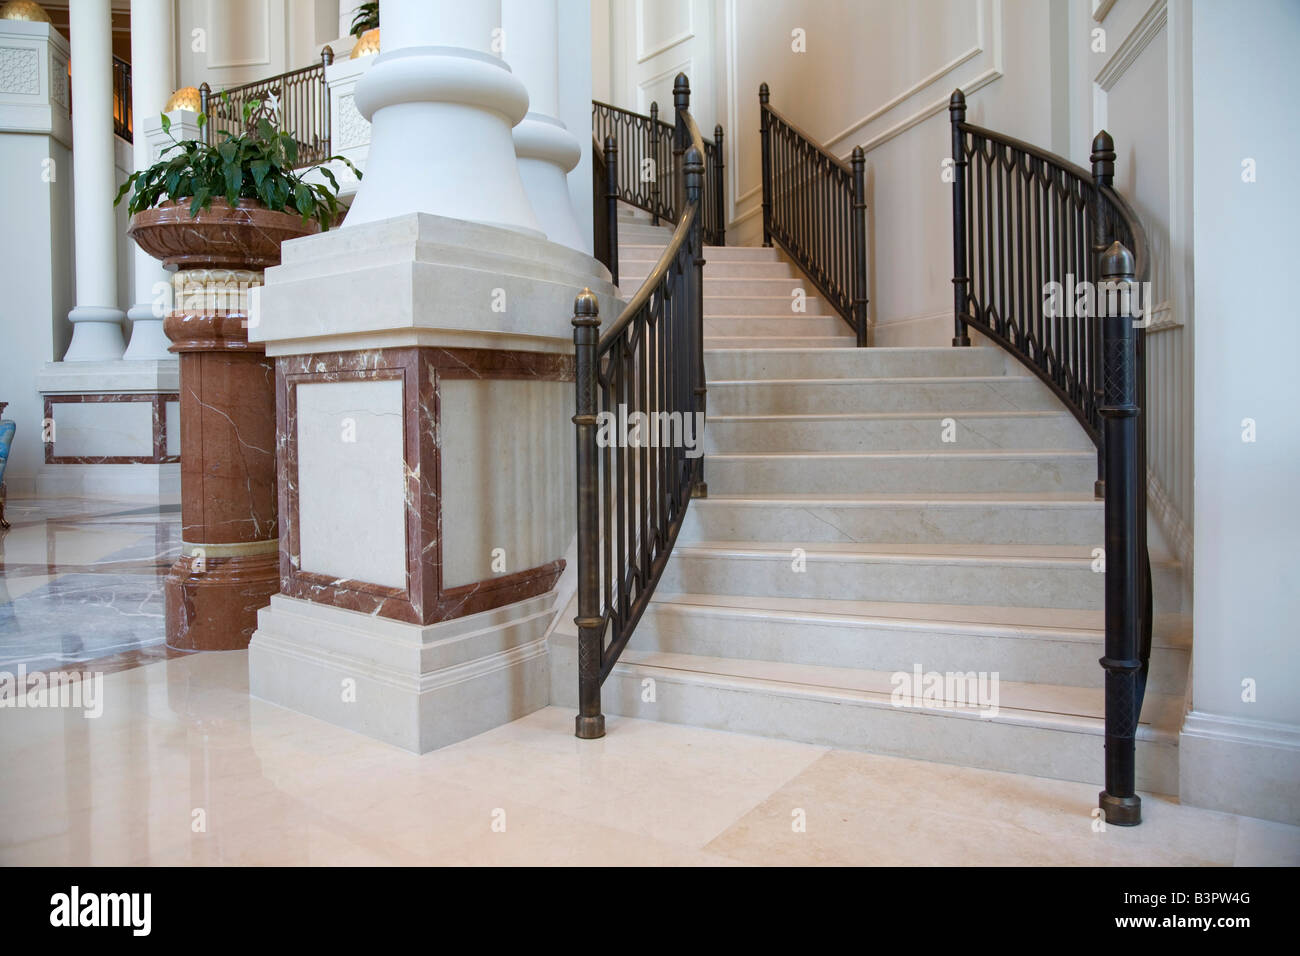 Four Seasons Hotel 5 hôtel de luxe 5 étoiles Doha Qatar Photo Stock